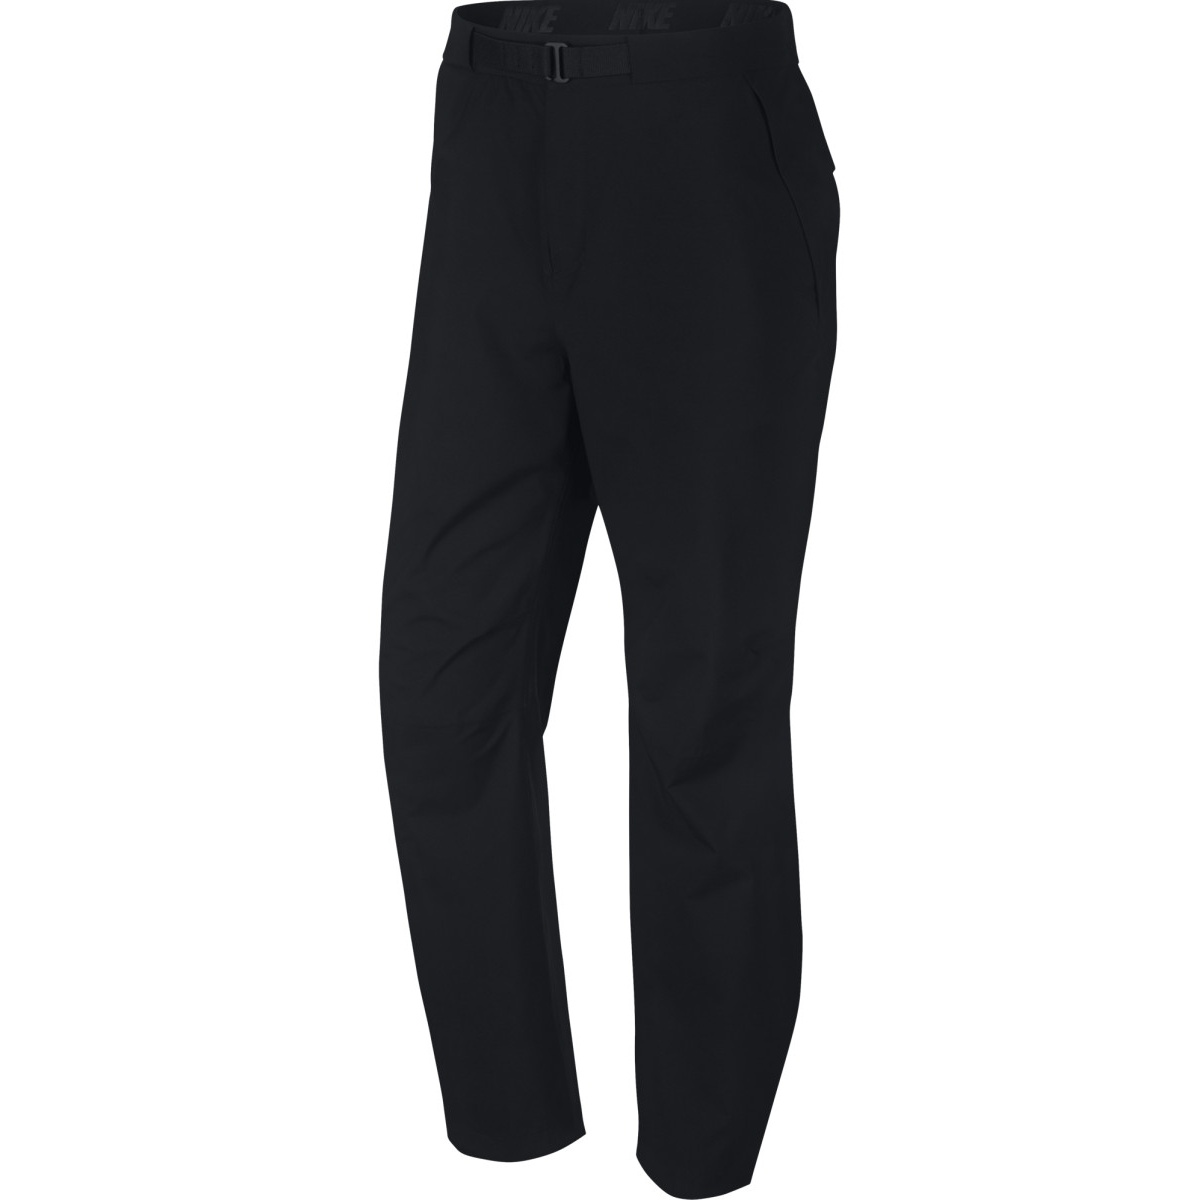 Nike Mens Hypershield Core Trousers (XXL) (Black)